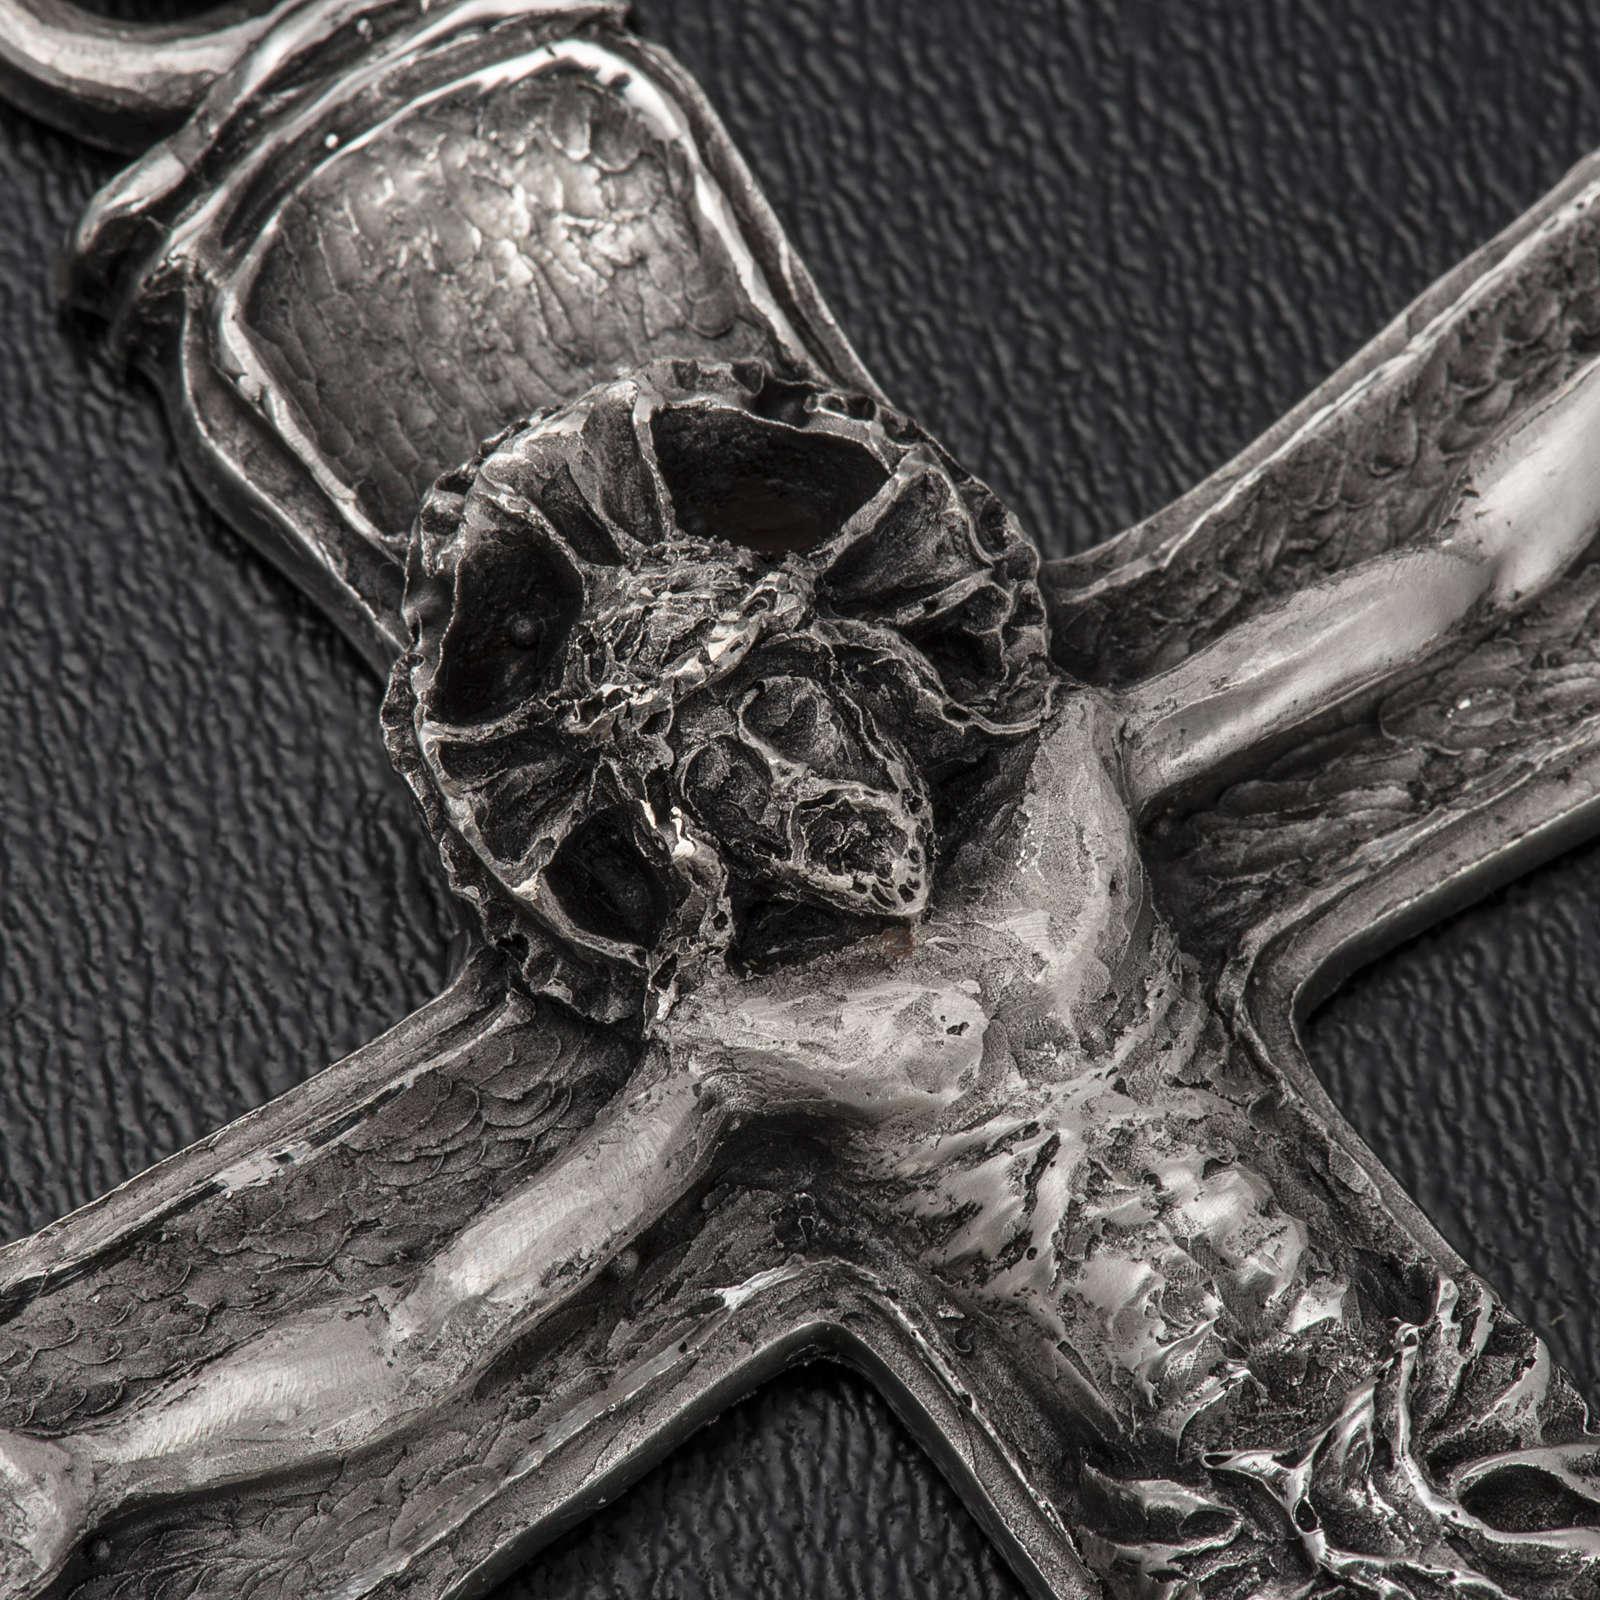 Croce vescovo argento 925 3